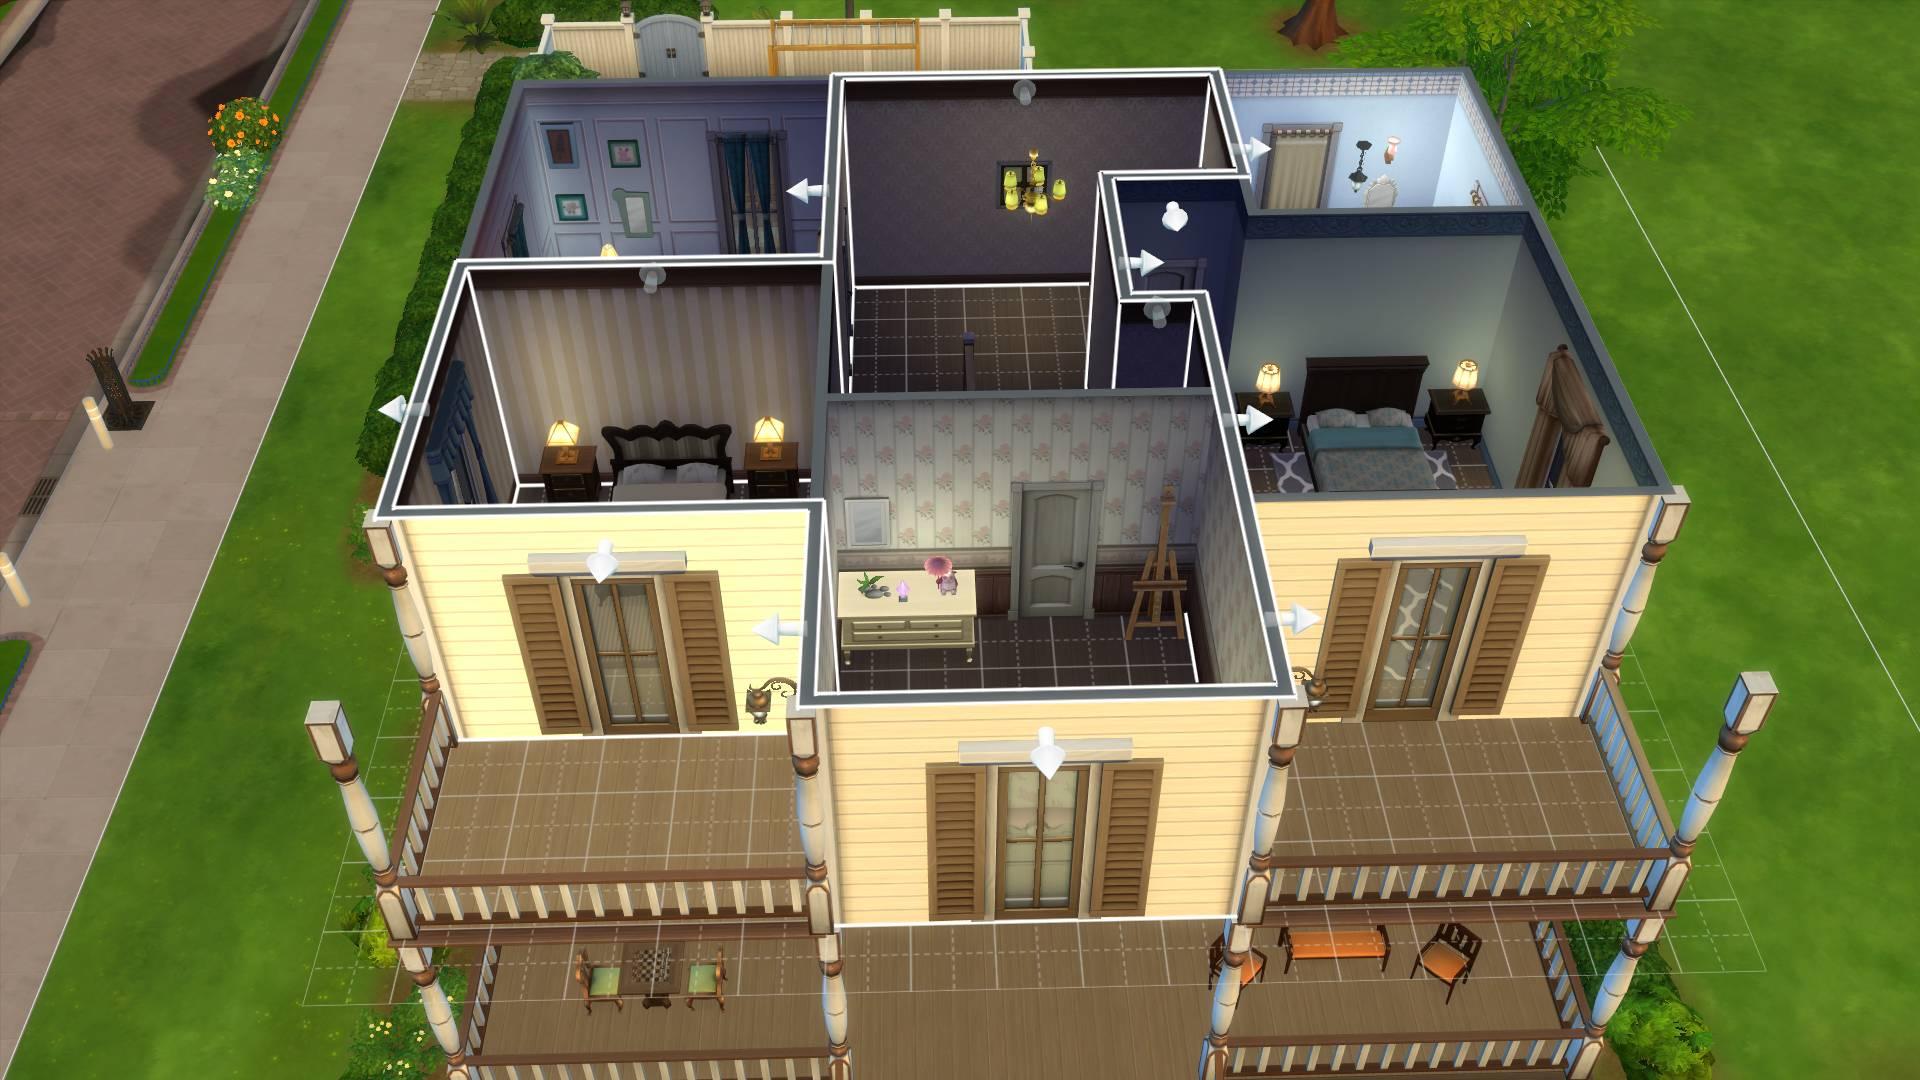 Solved: Sim won't go through certain doors - Answer HQ